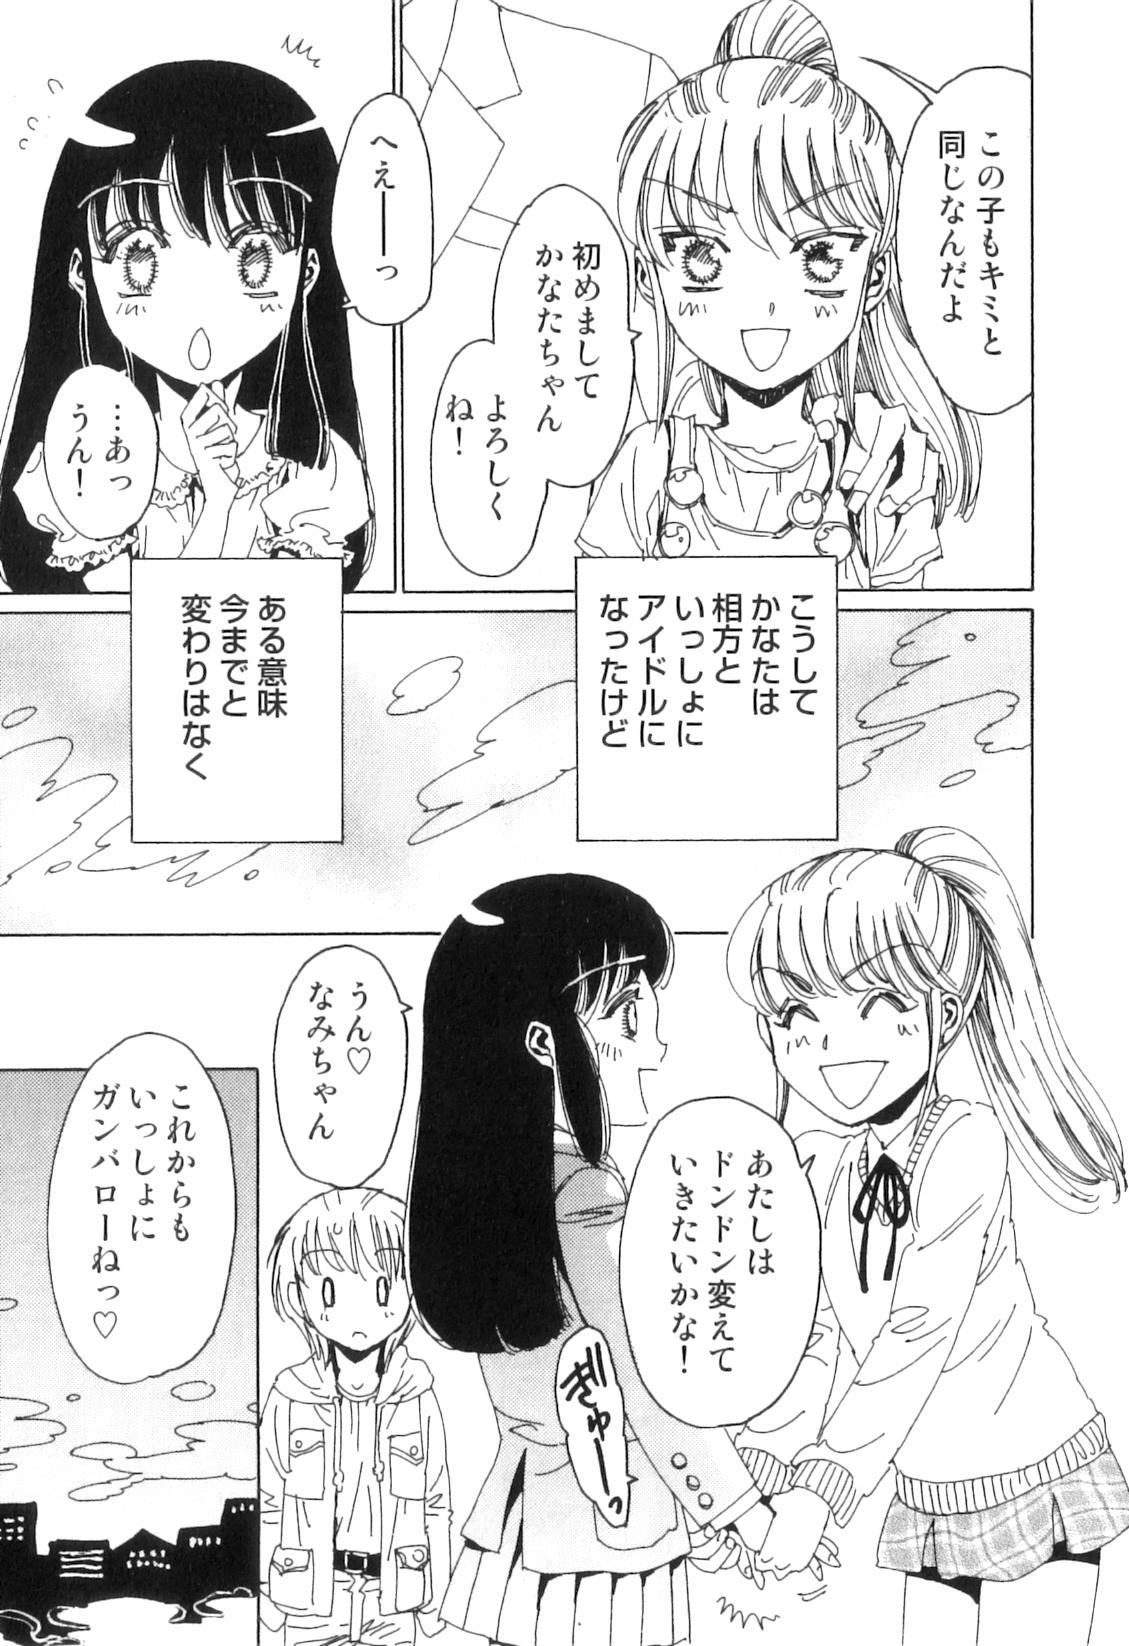 Yuni-Hapi 15